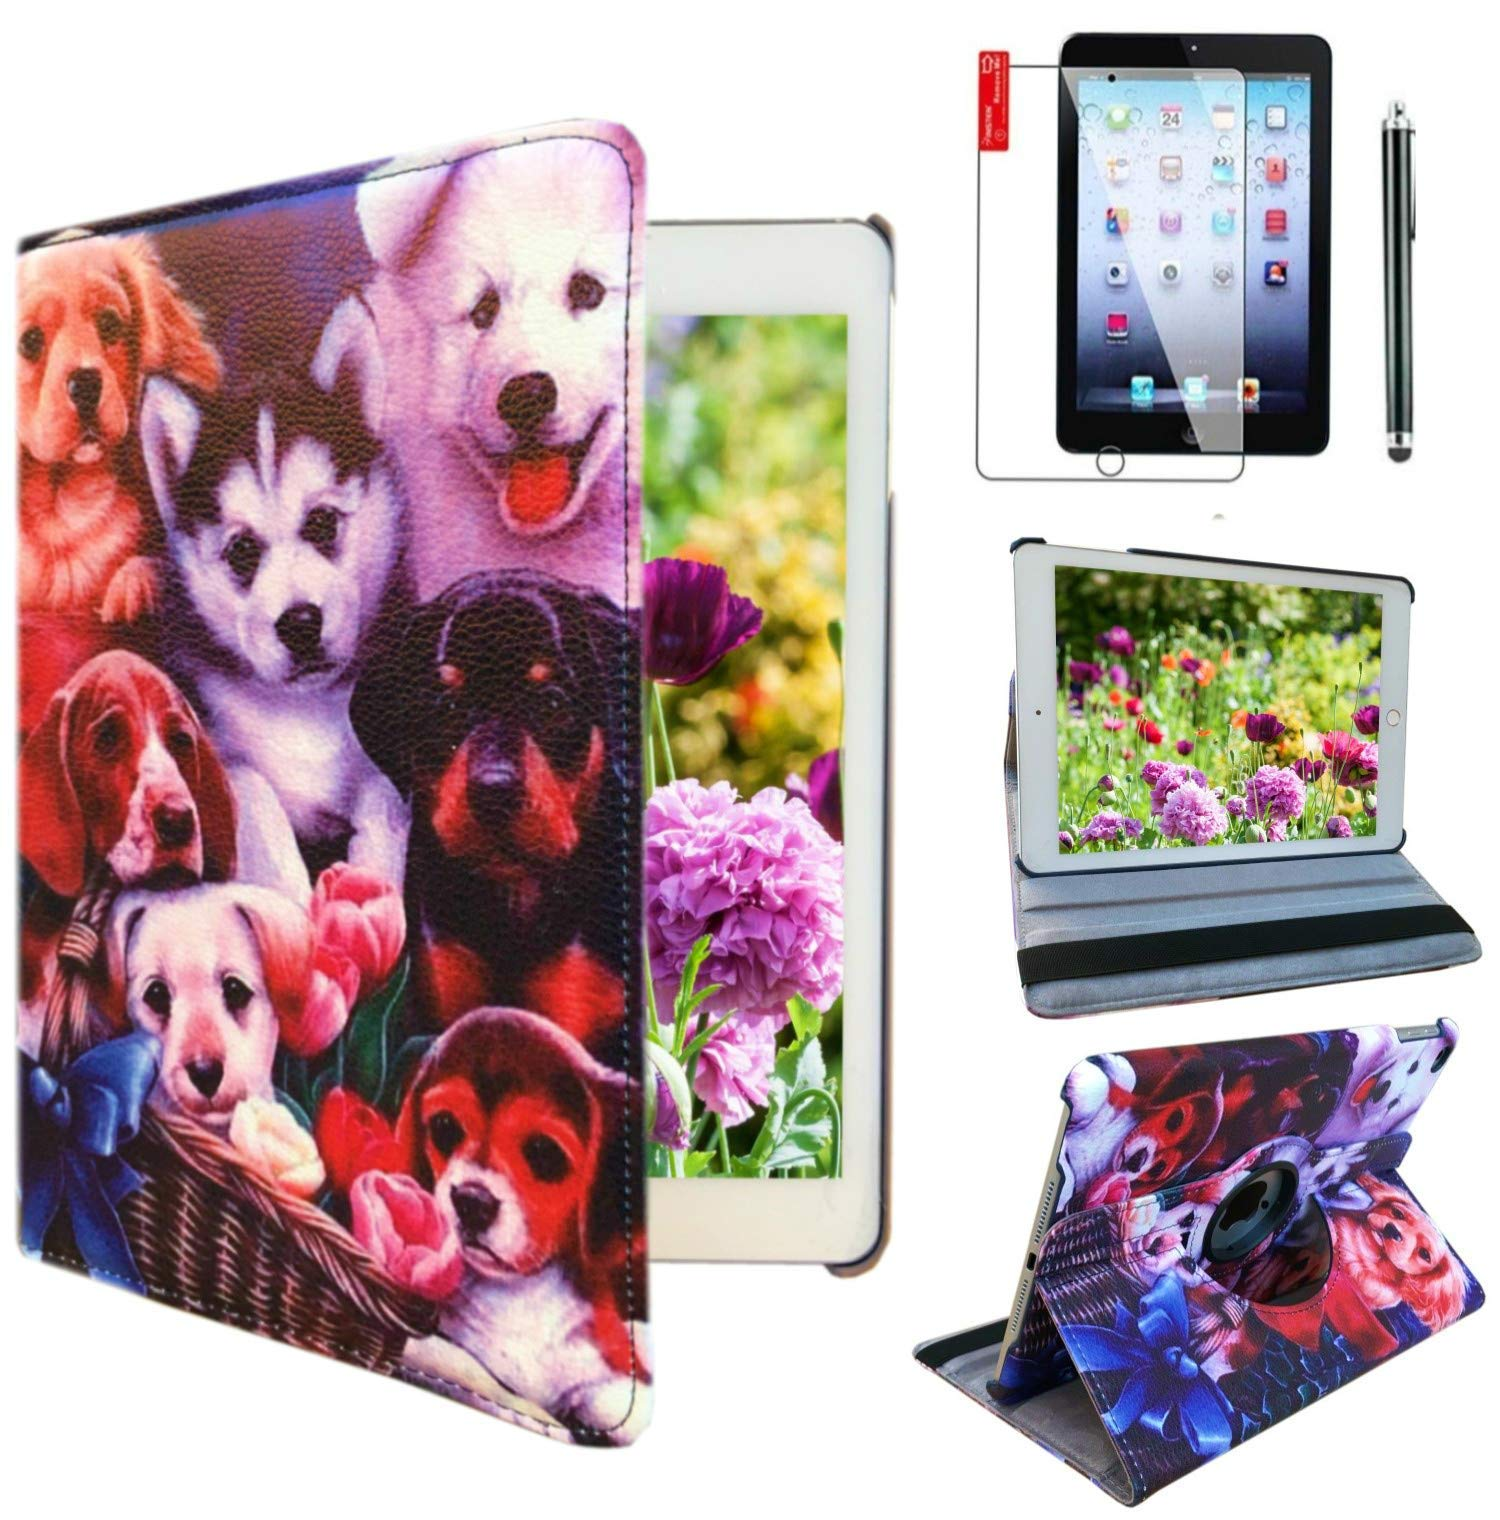 Ipad Case for Apple ipad Mini 1st, 2nd, 3rd Generation Model : A1432, A1454, A1455, A1489, A1490, A1491, A1599, A1600 or A1601 (Dog Design)